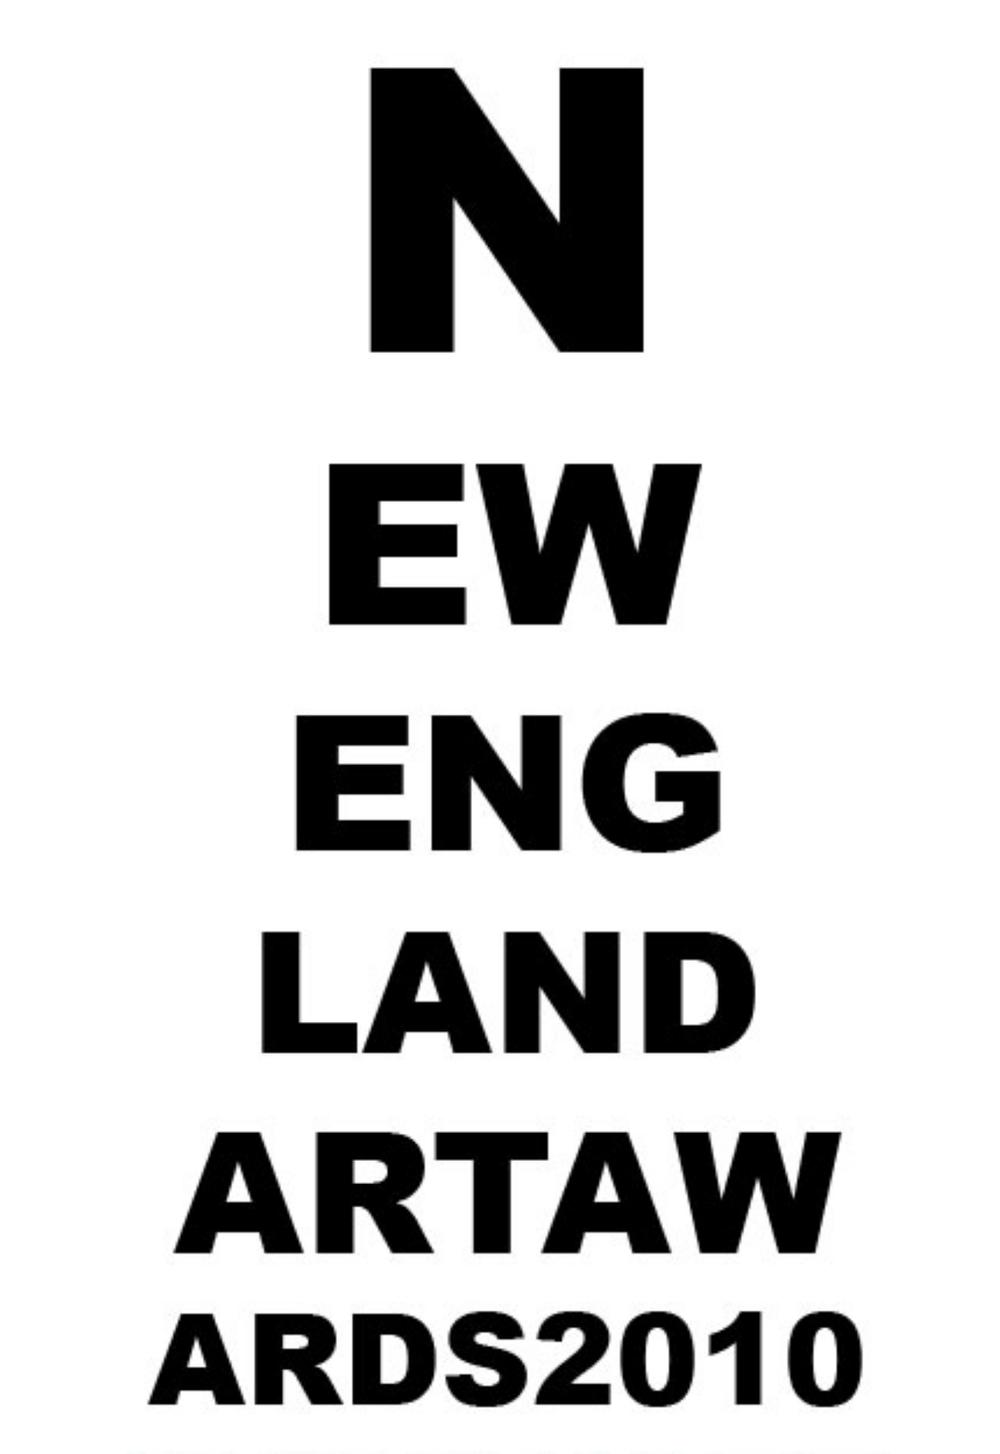 AWARD - New England Art Award for Best Performance/Street Artist | 2010